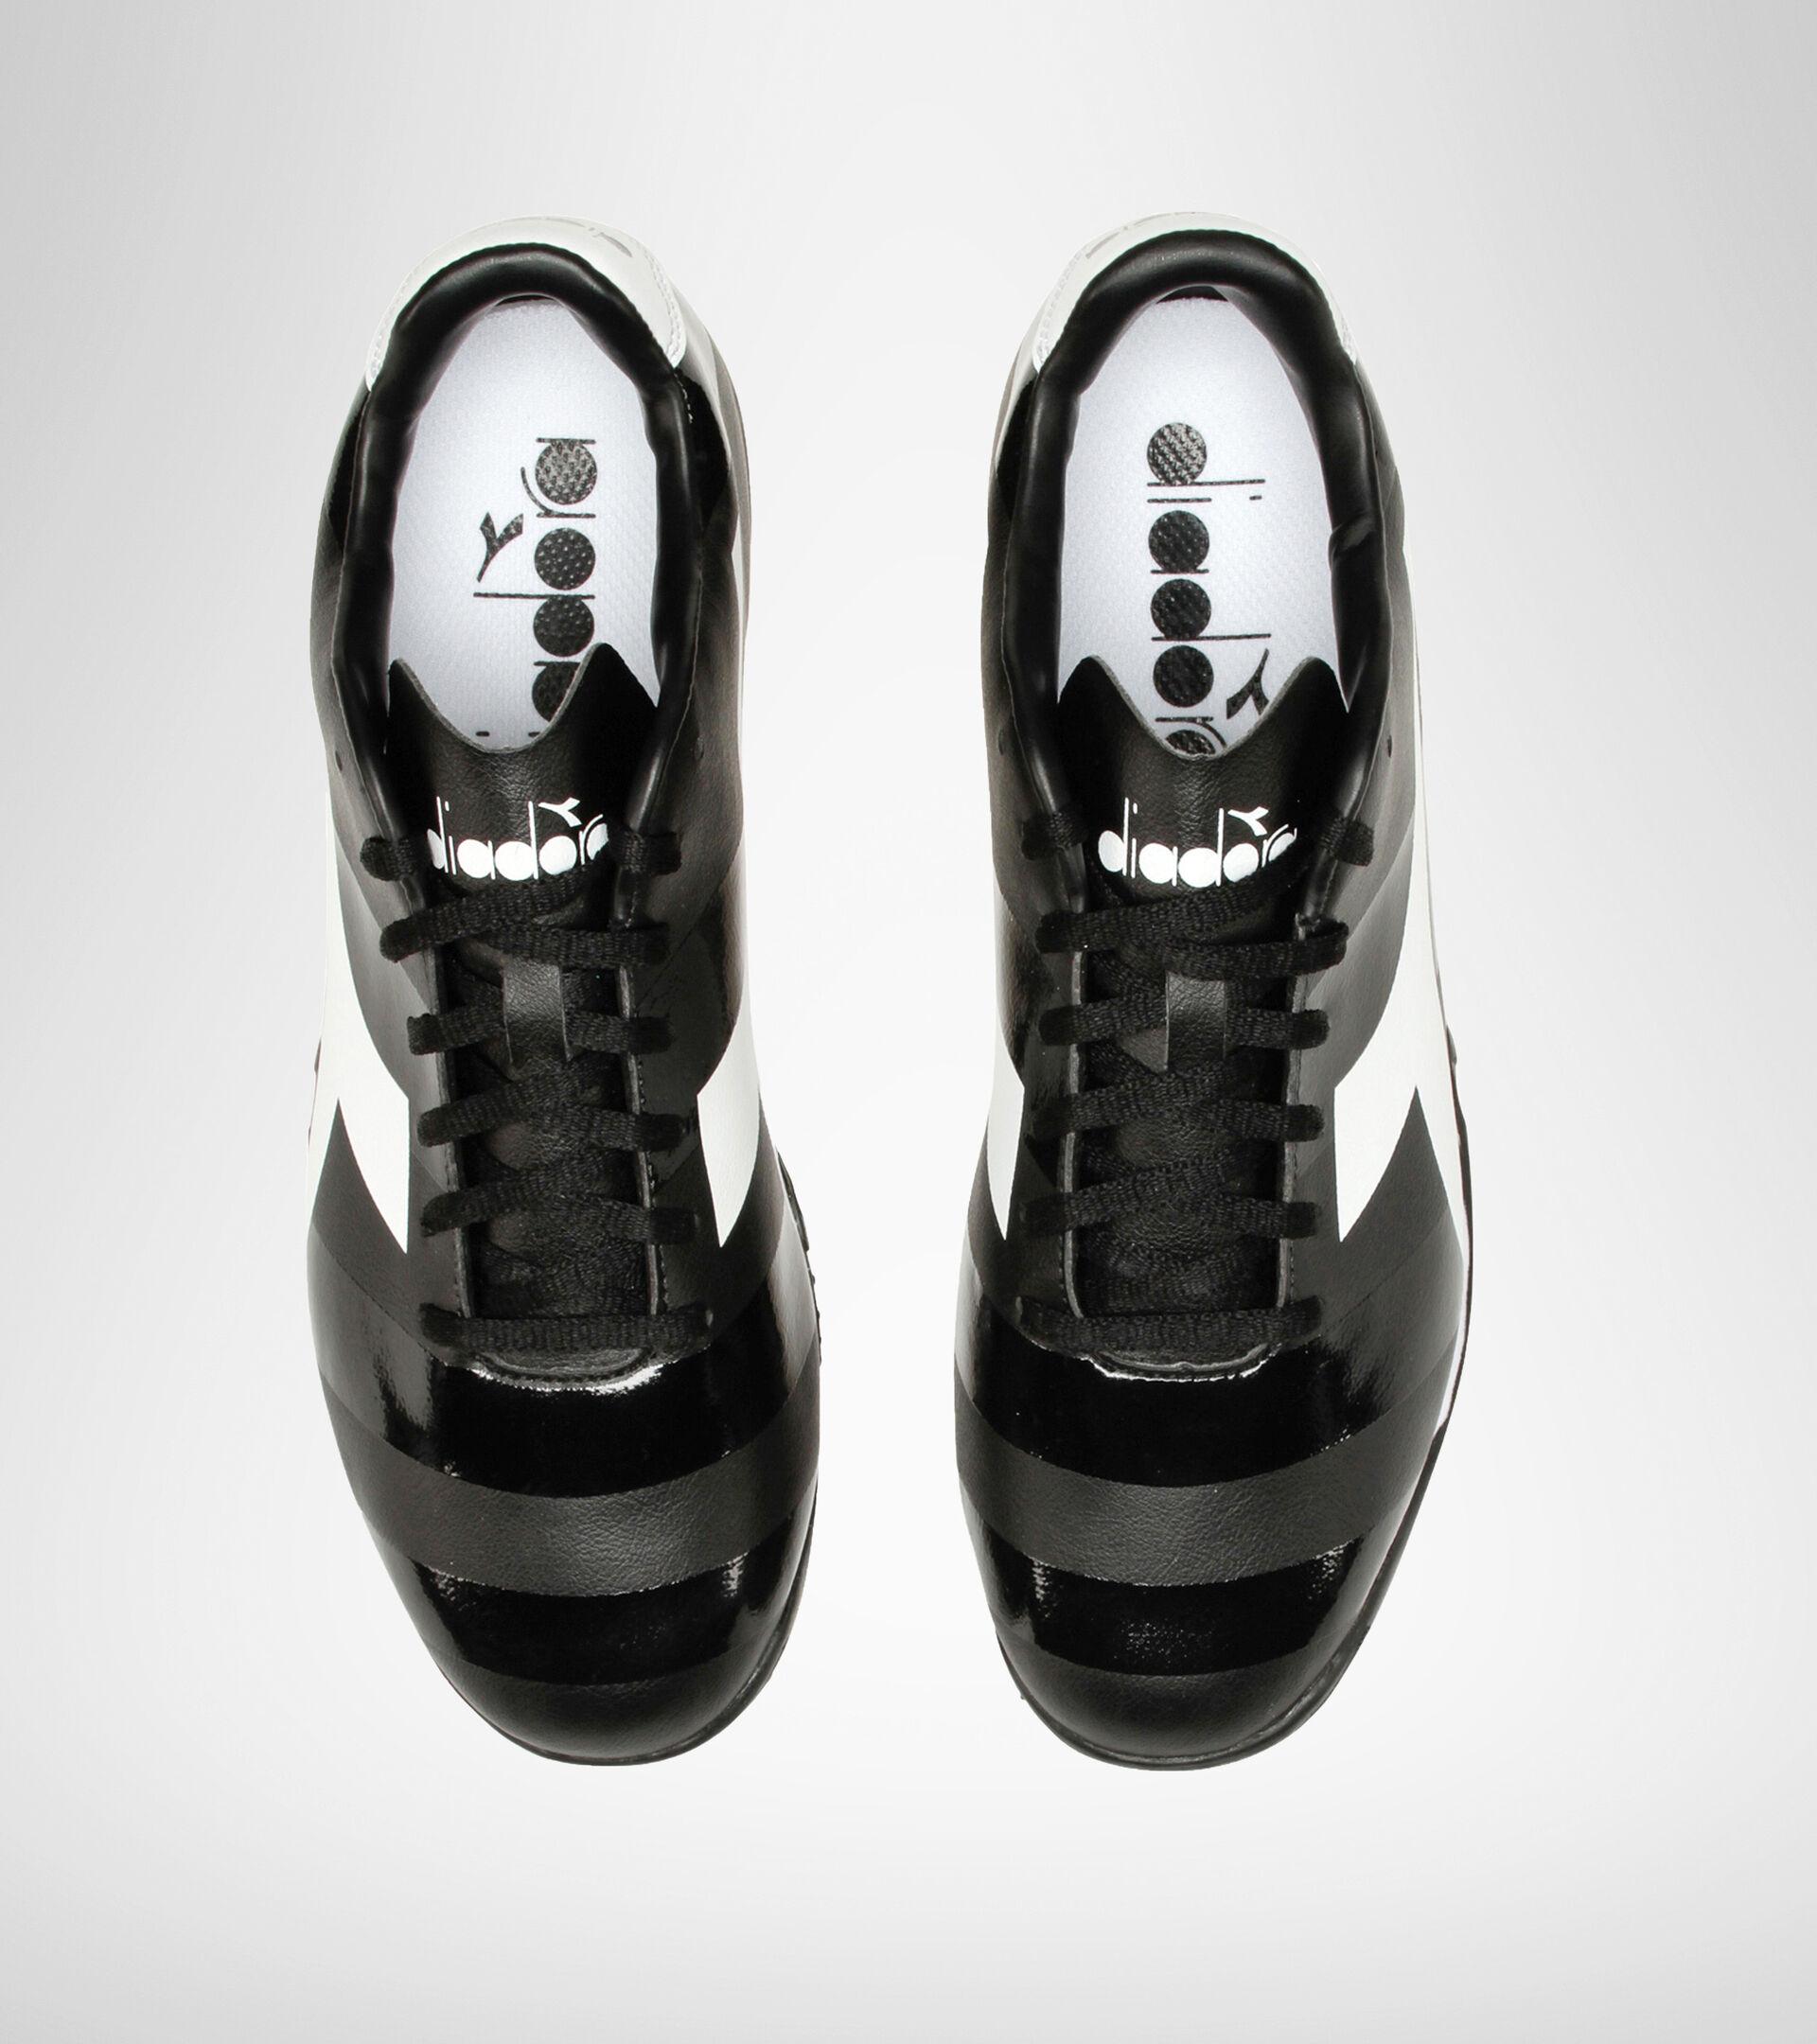 Footwear Sport UOMO RAPTOR R TF NERO/NERO/BIANCO Diadora